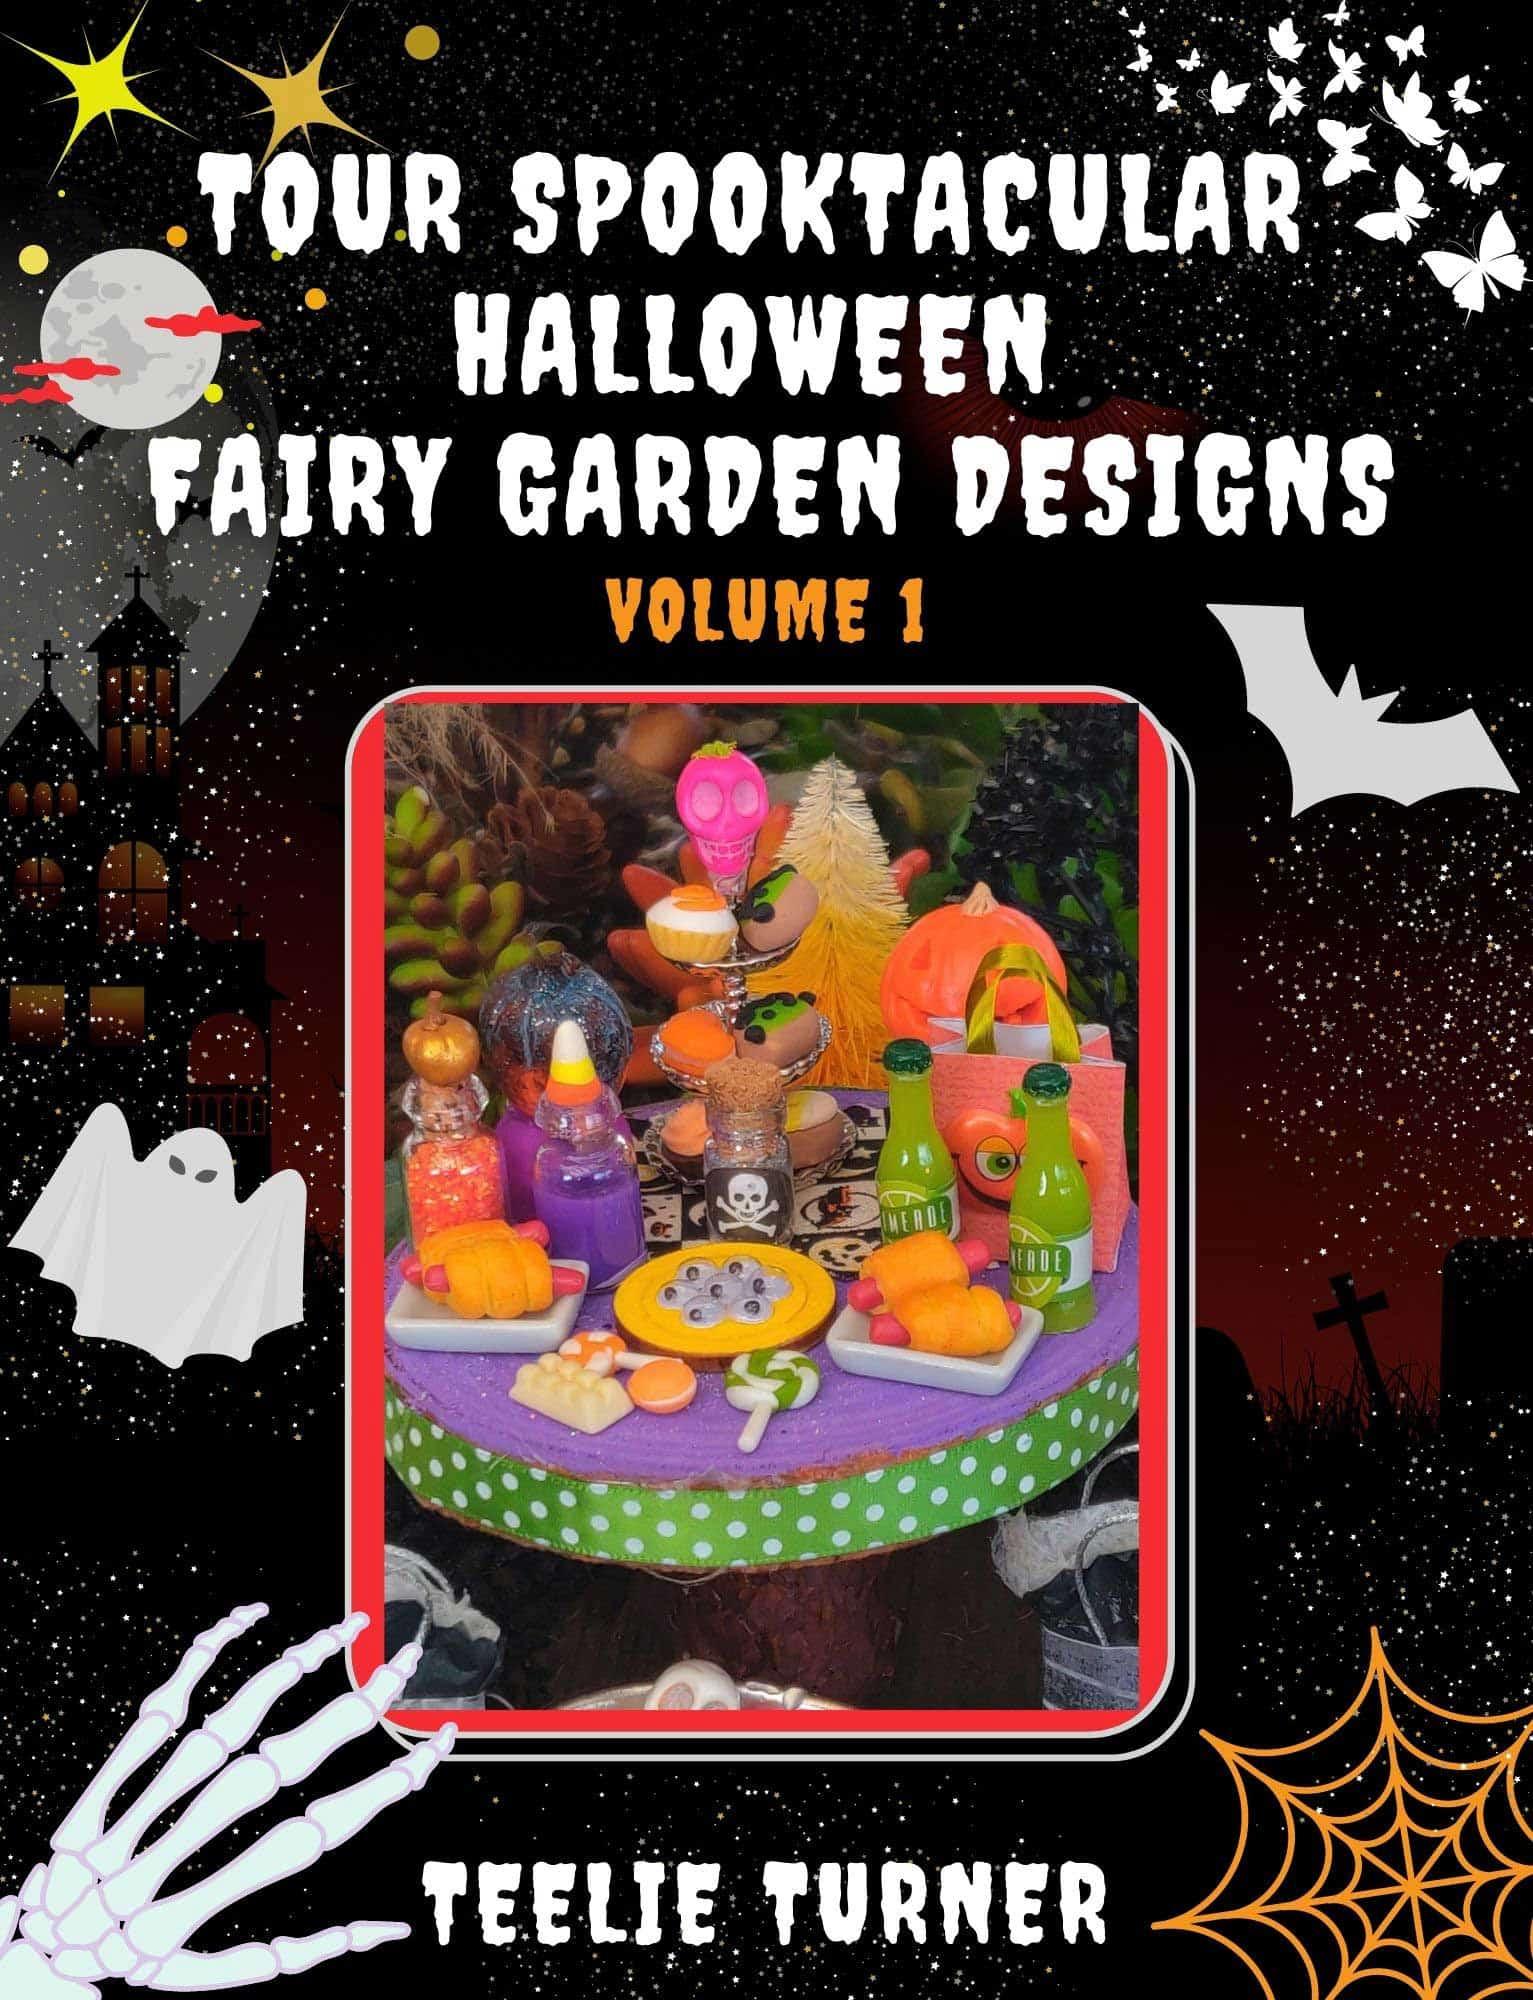 Kindle Vol.1 Halloween Etsy Photo Book 8.625x11.25